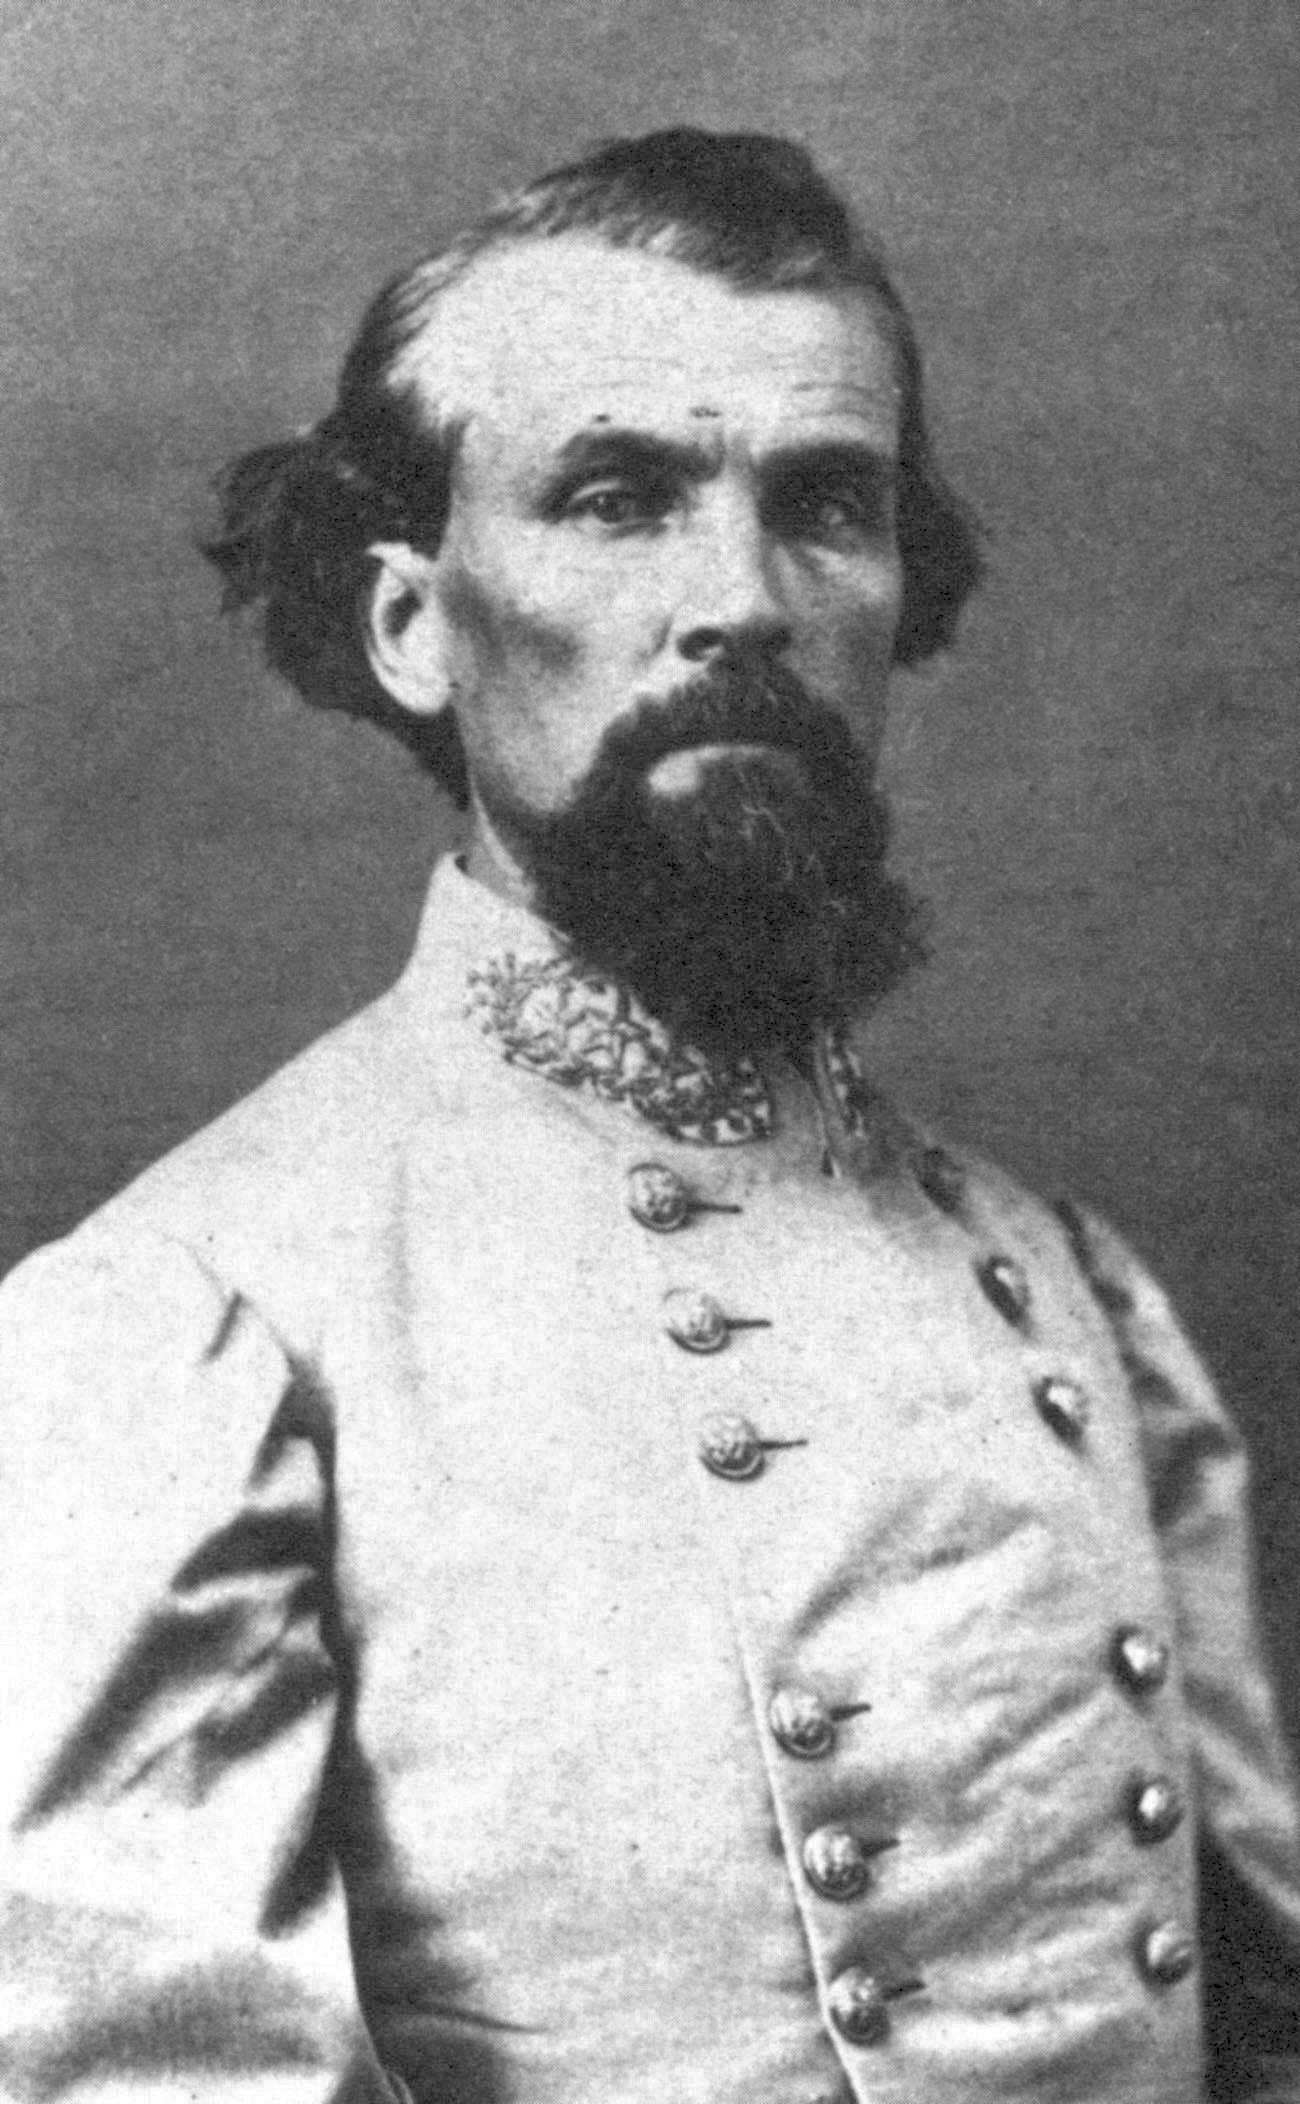 Nathan Bedford Forrest, Confederate Badass